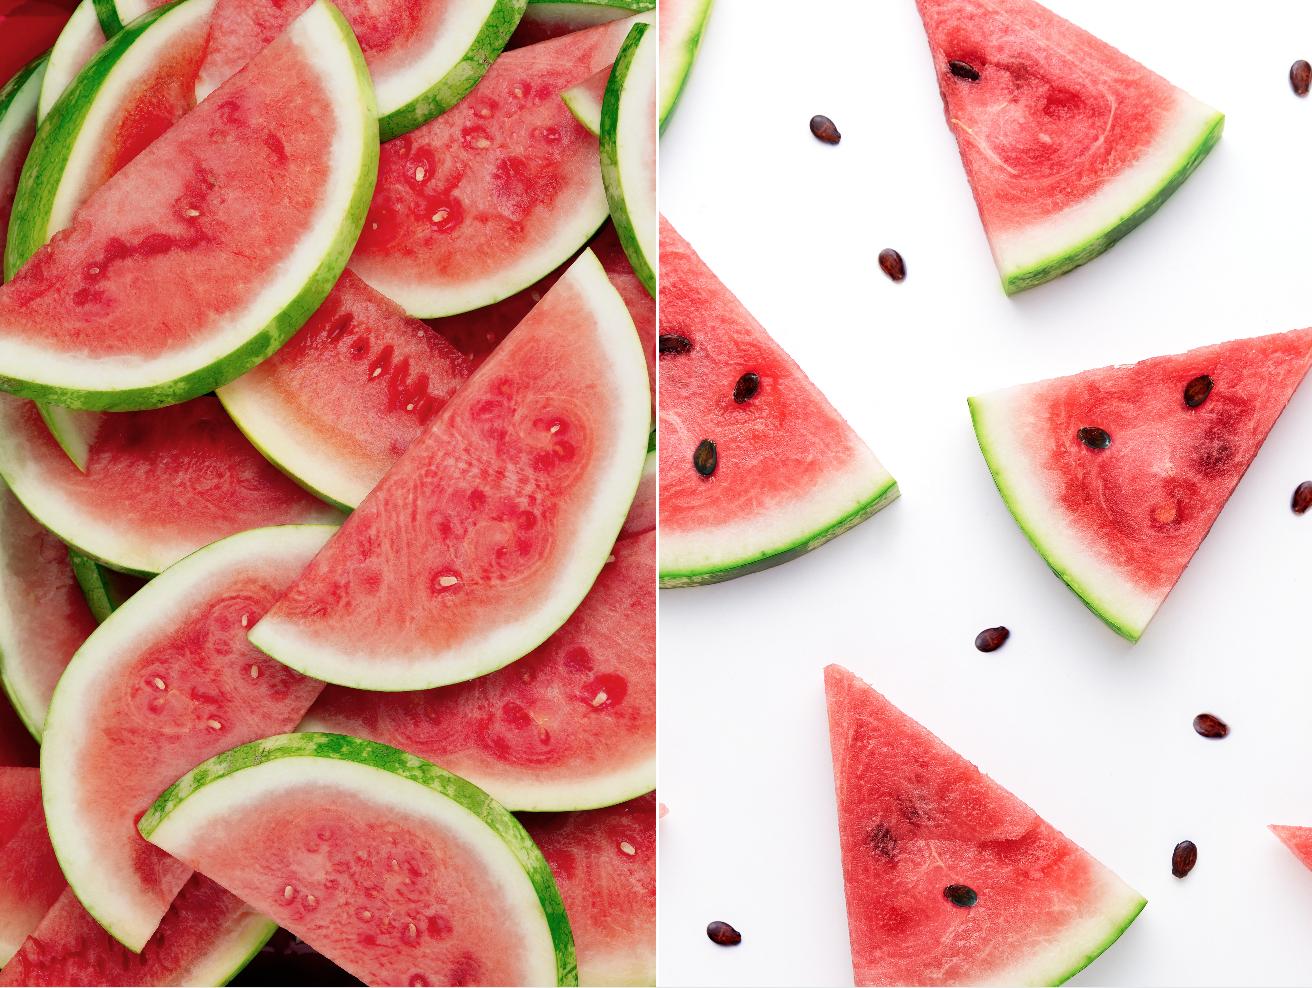 Seedless vs. Seeded Watermelon Getty 8/14/19